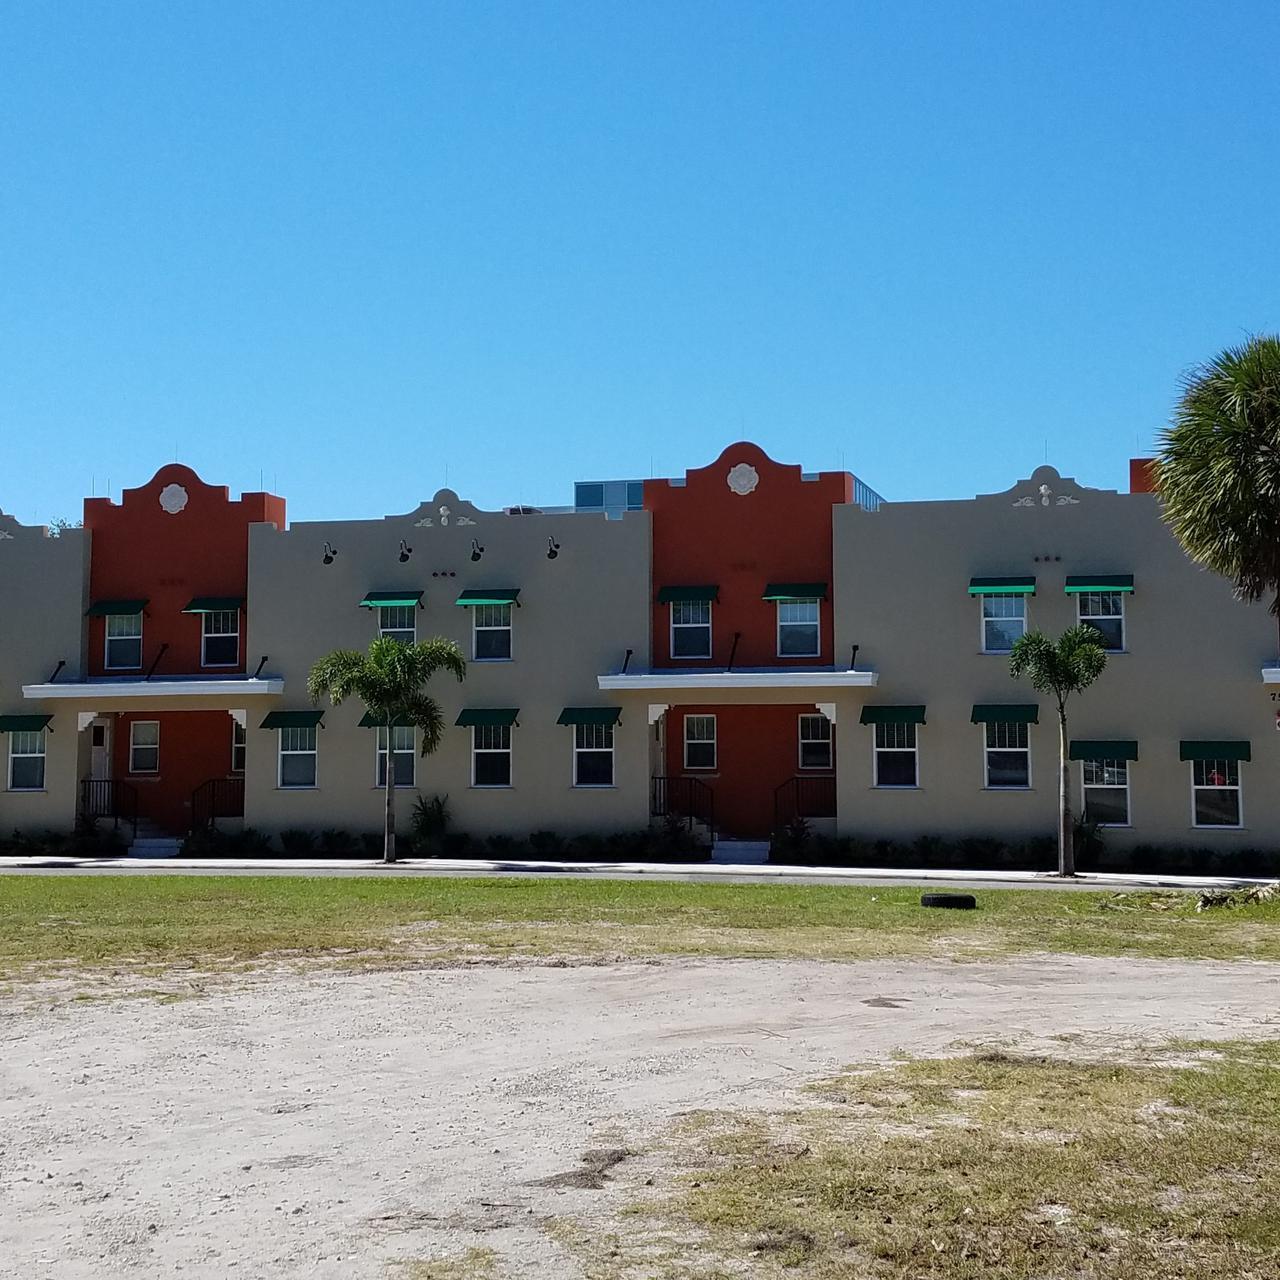 florida-housing-4-e1514911592729.jpg